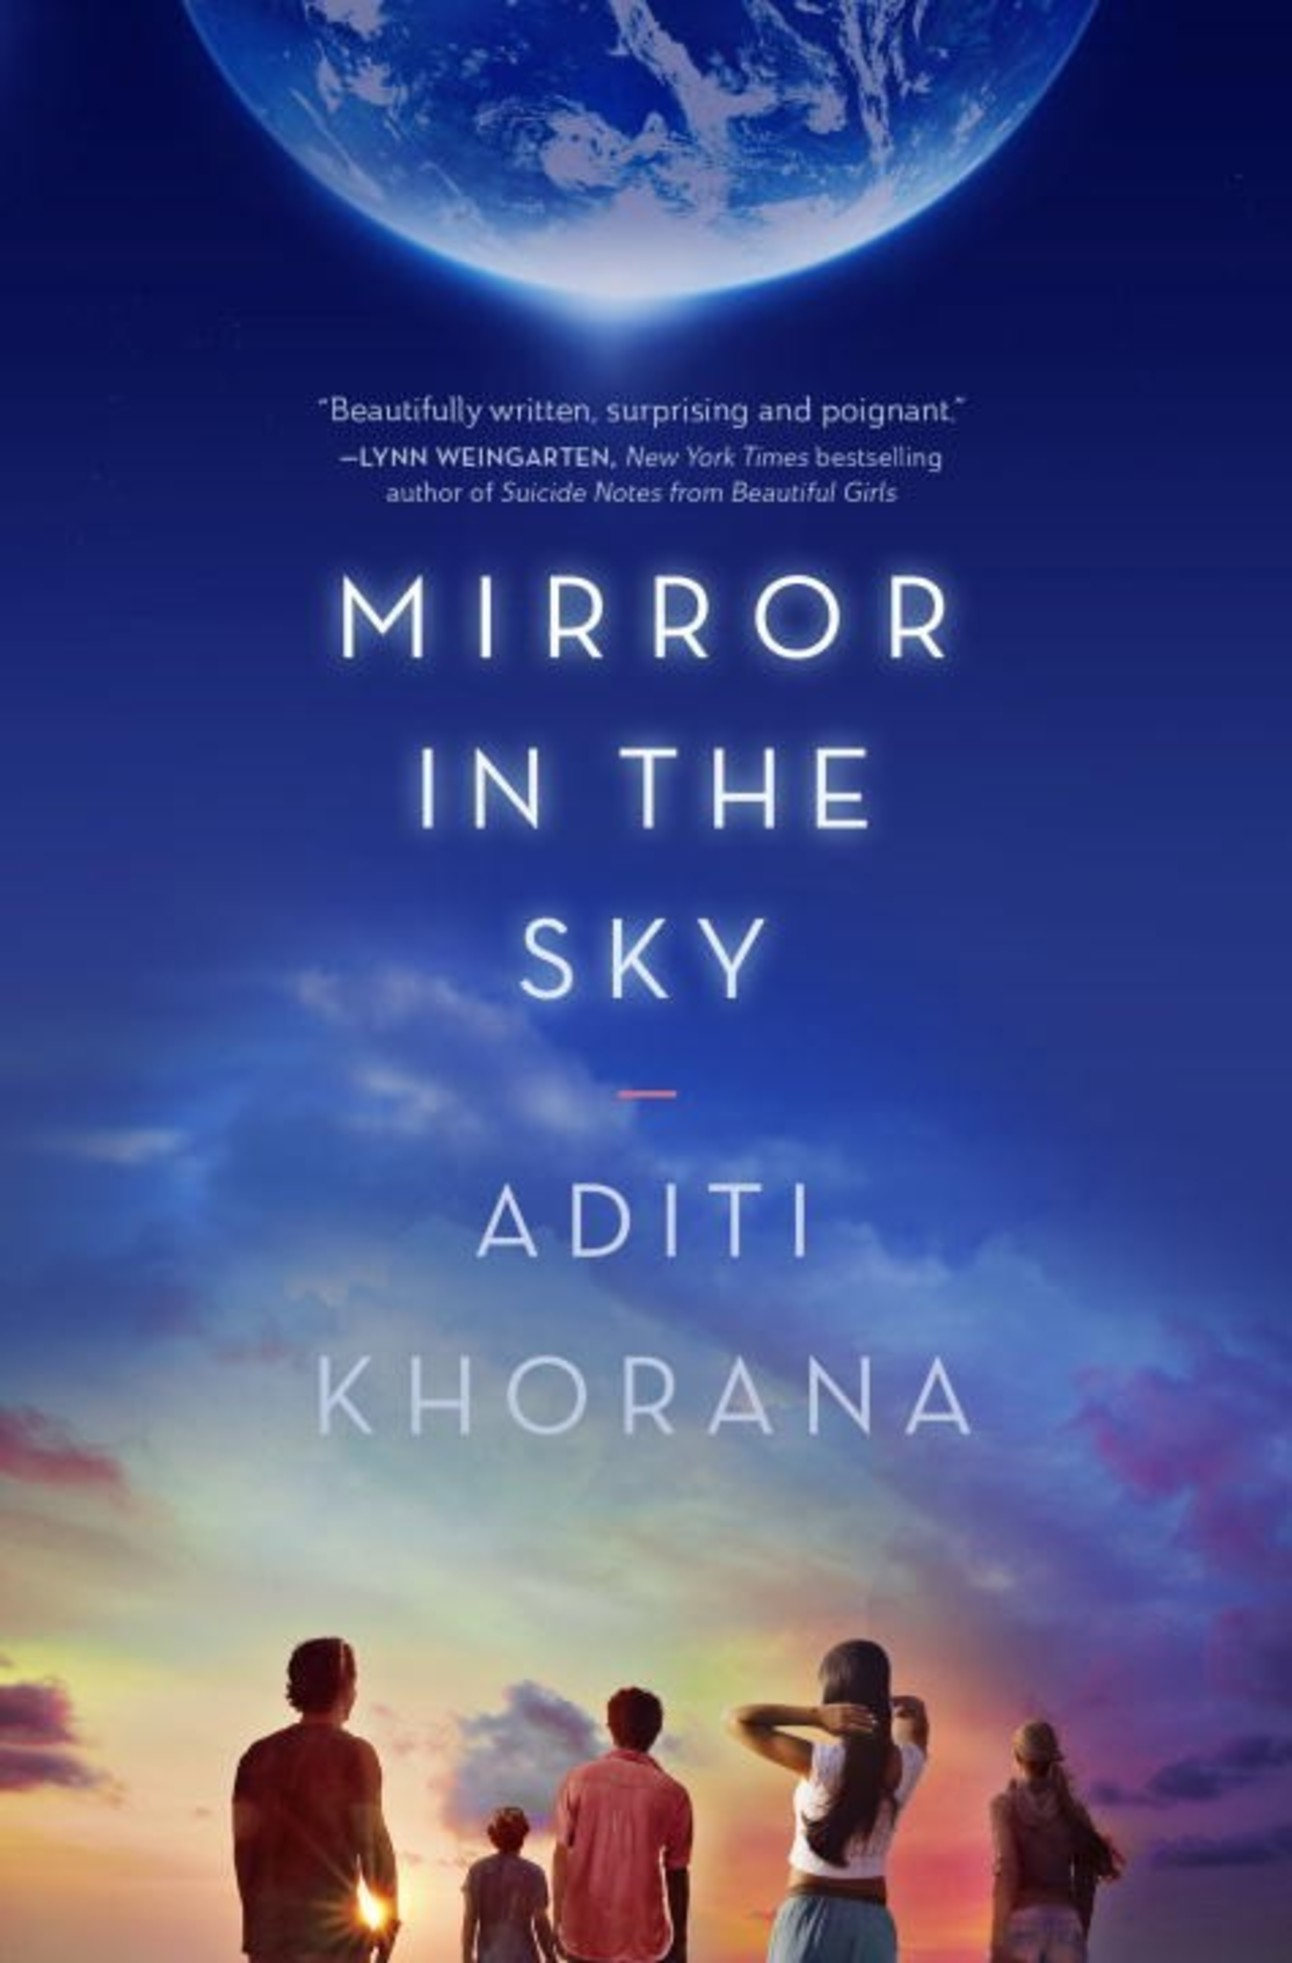 mirror in the sky aditi khorana